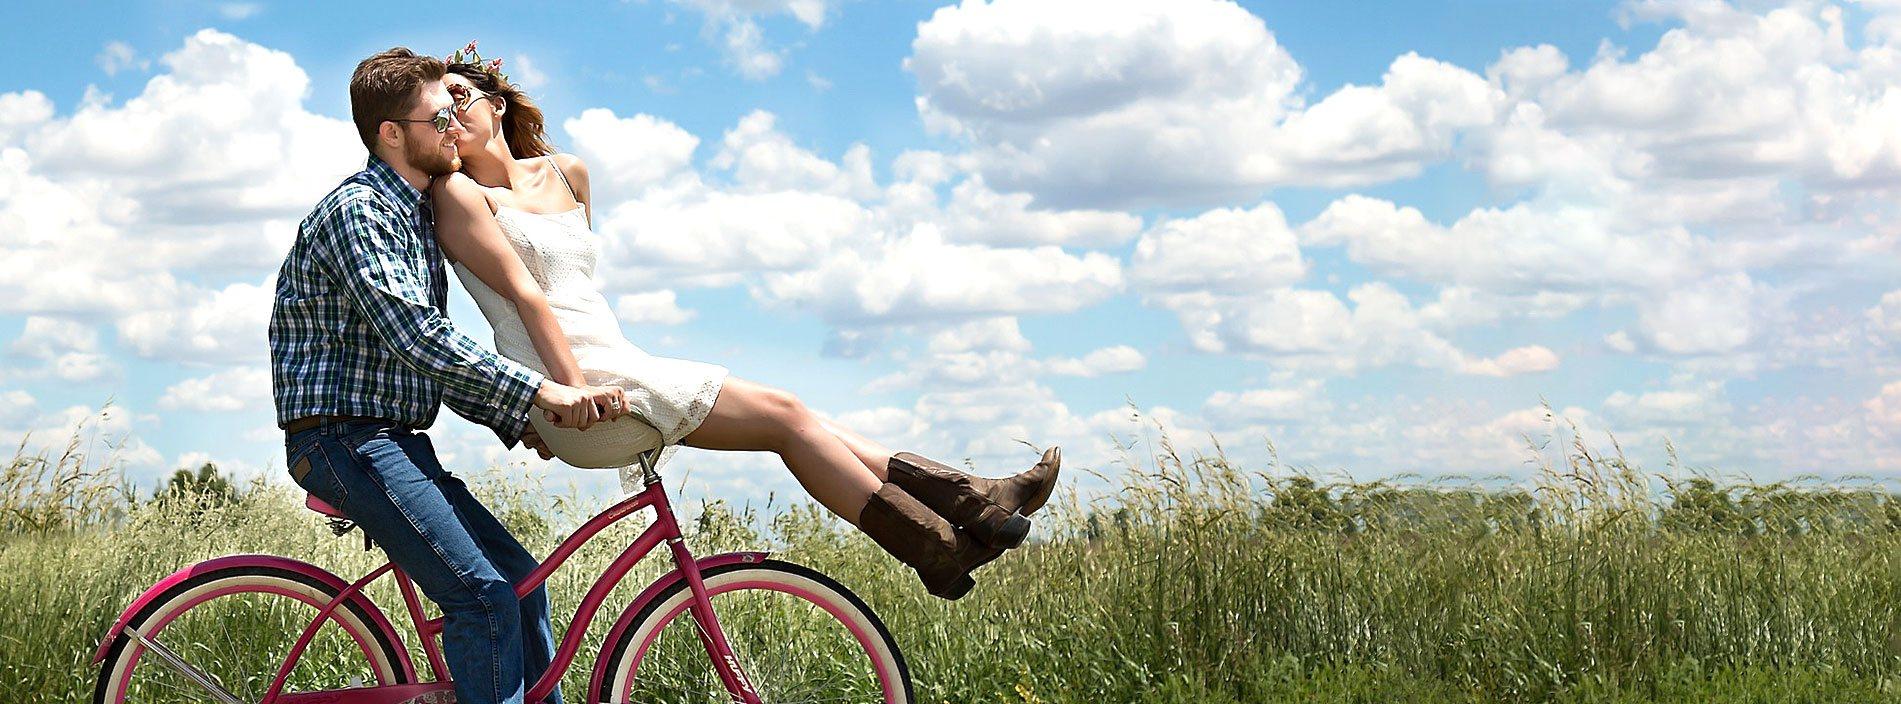 slider-fahrradtour